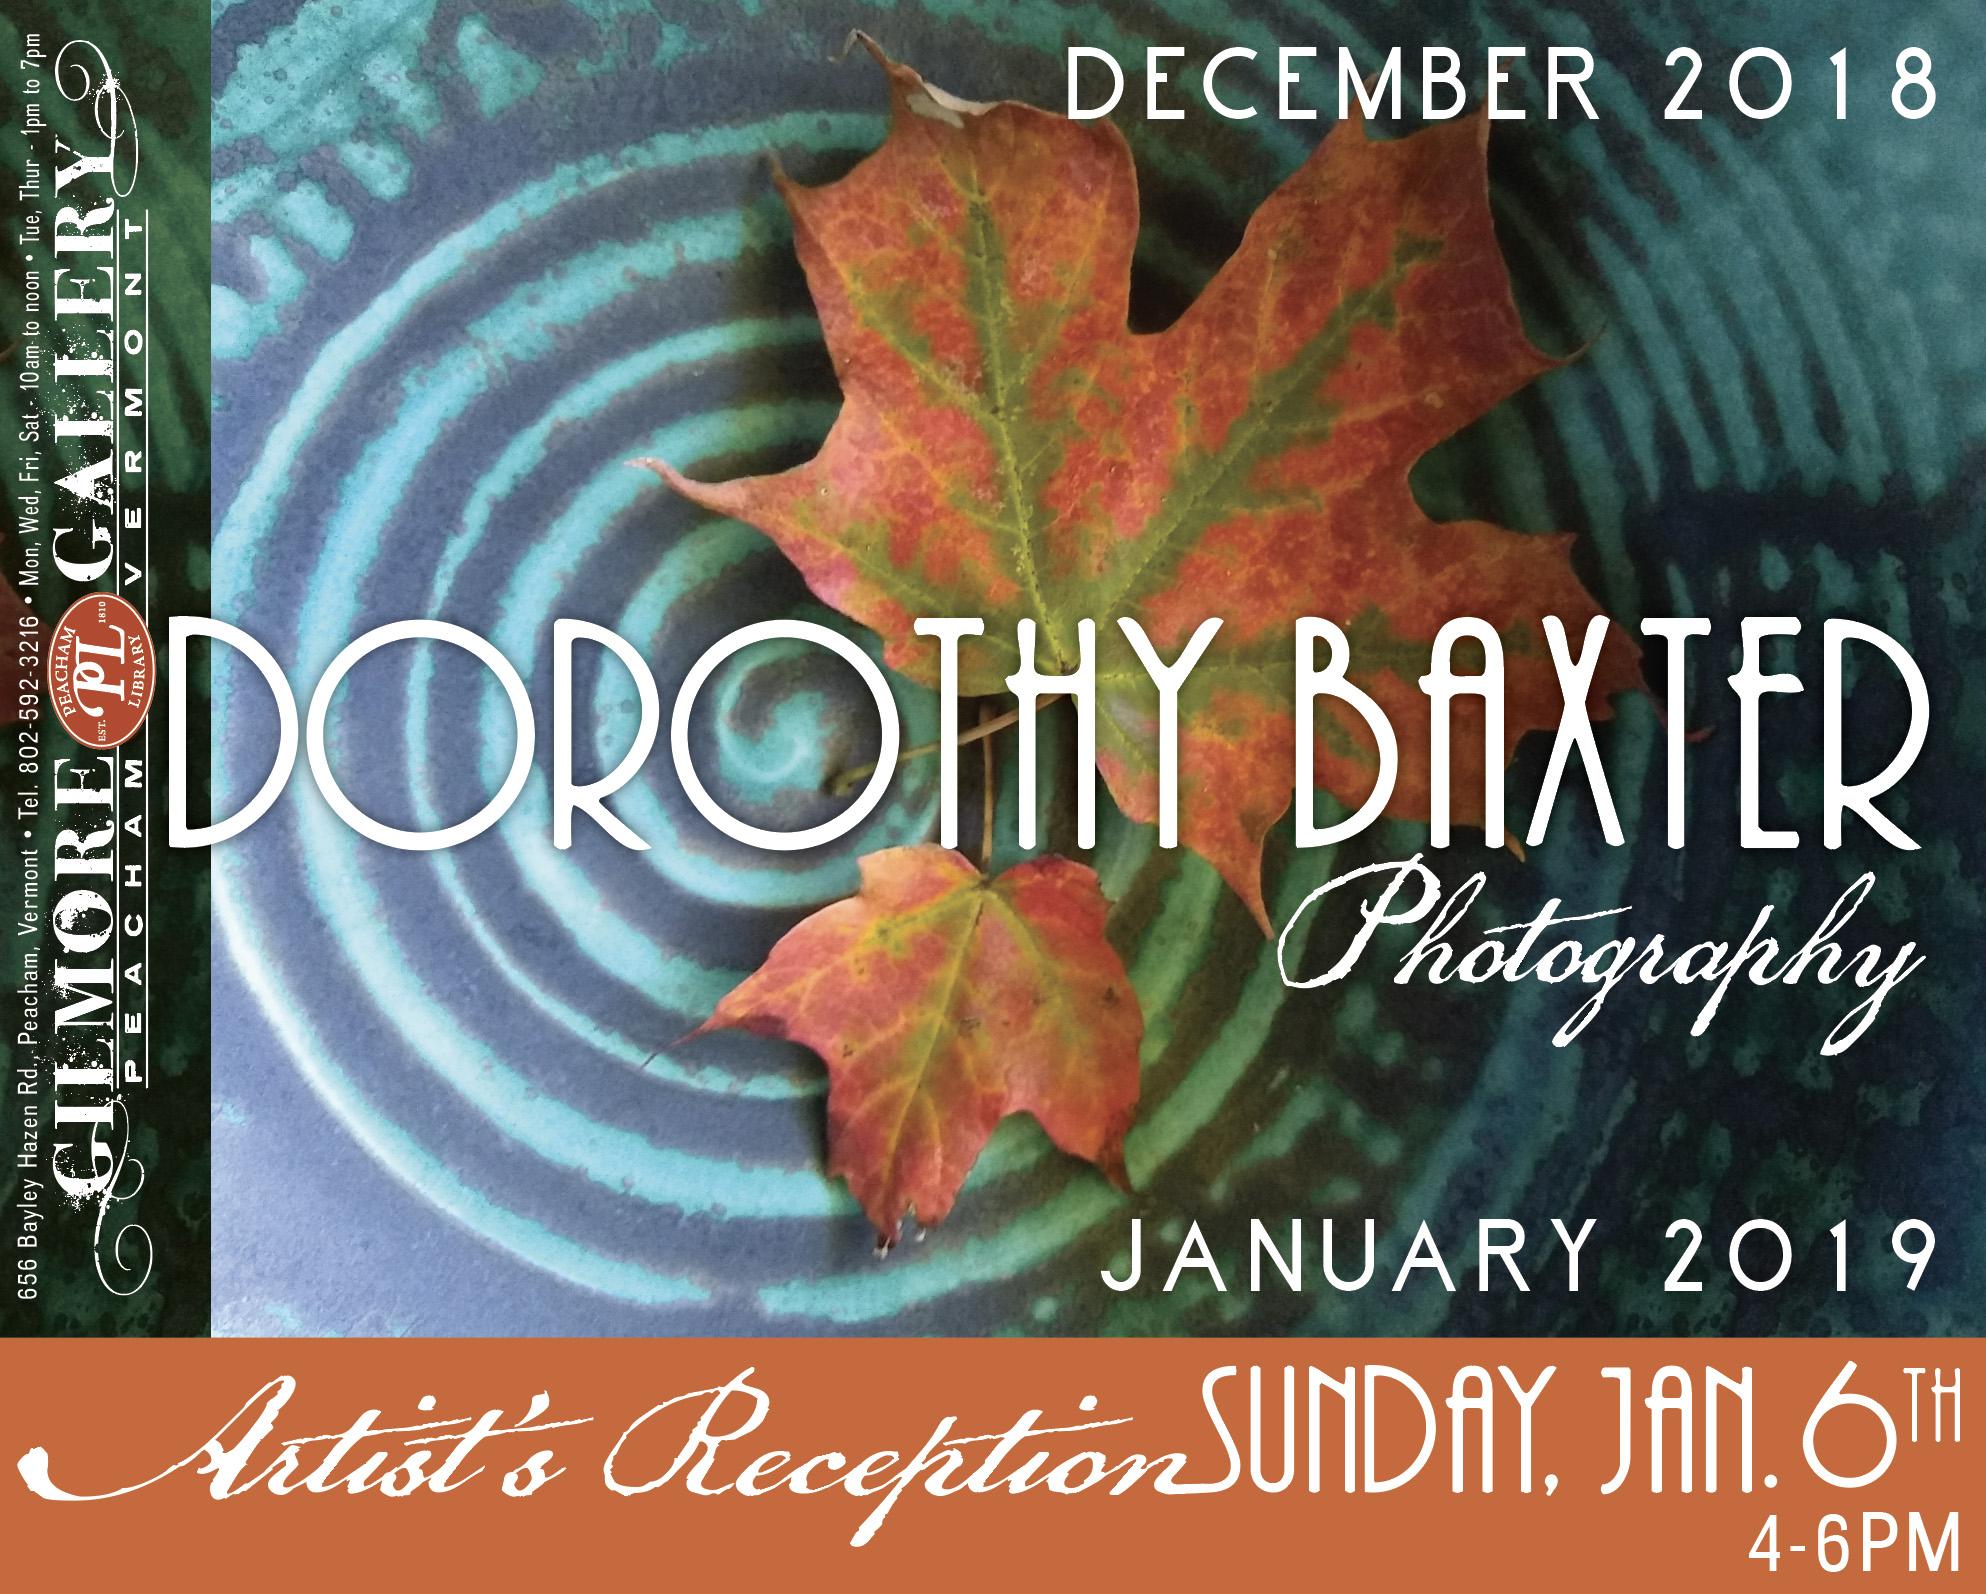 DorothyBaxterPosterwSnipe122718